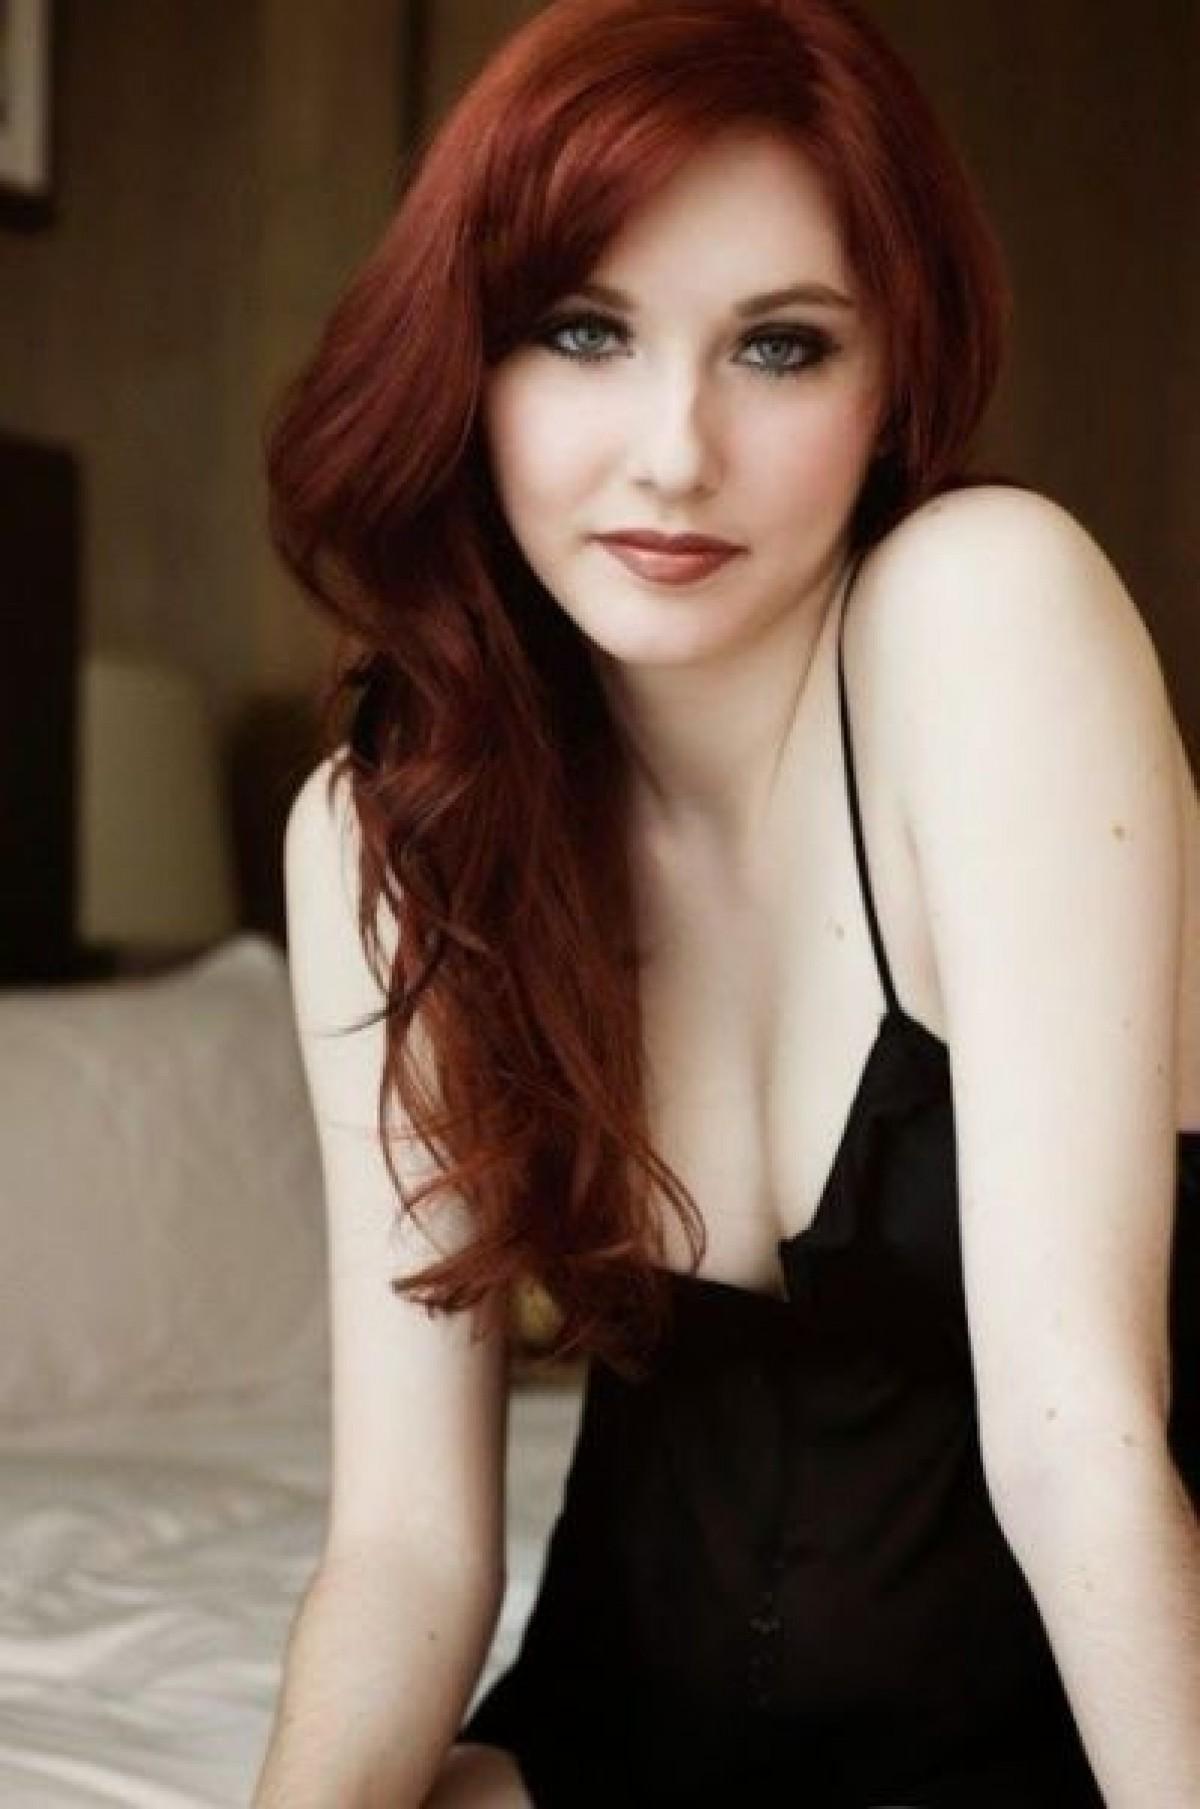 Babe naked red hair pornos image